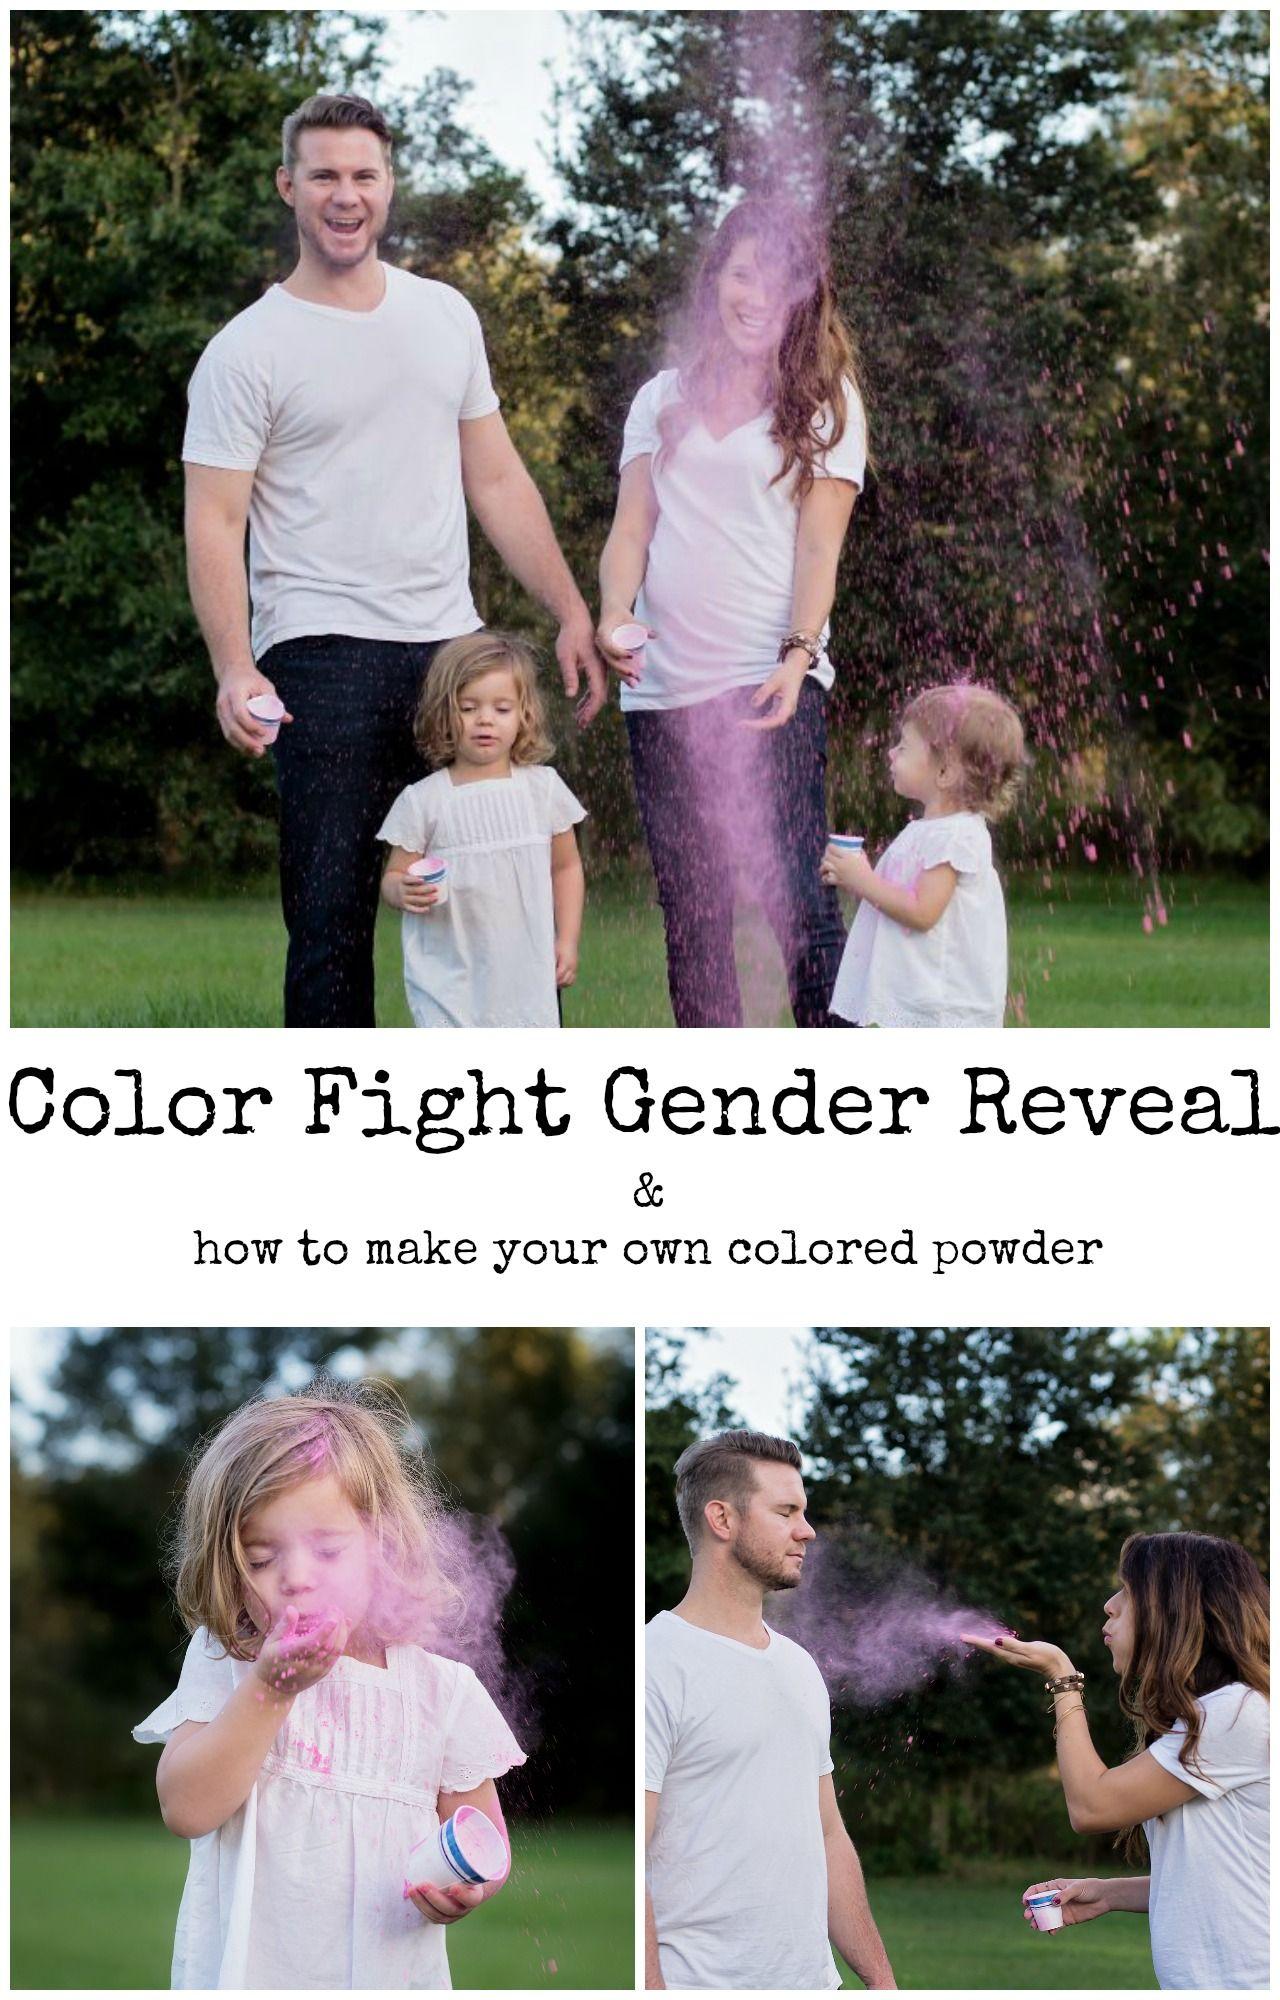 Color Powder Gender Reveal >> Gender Reveal Ideas Using Colored Powder Including Older Siblings